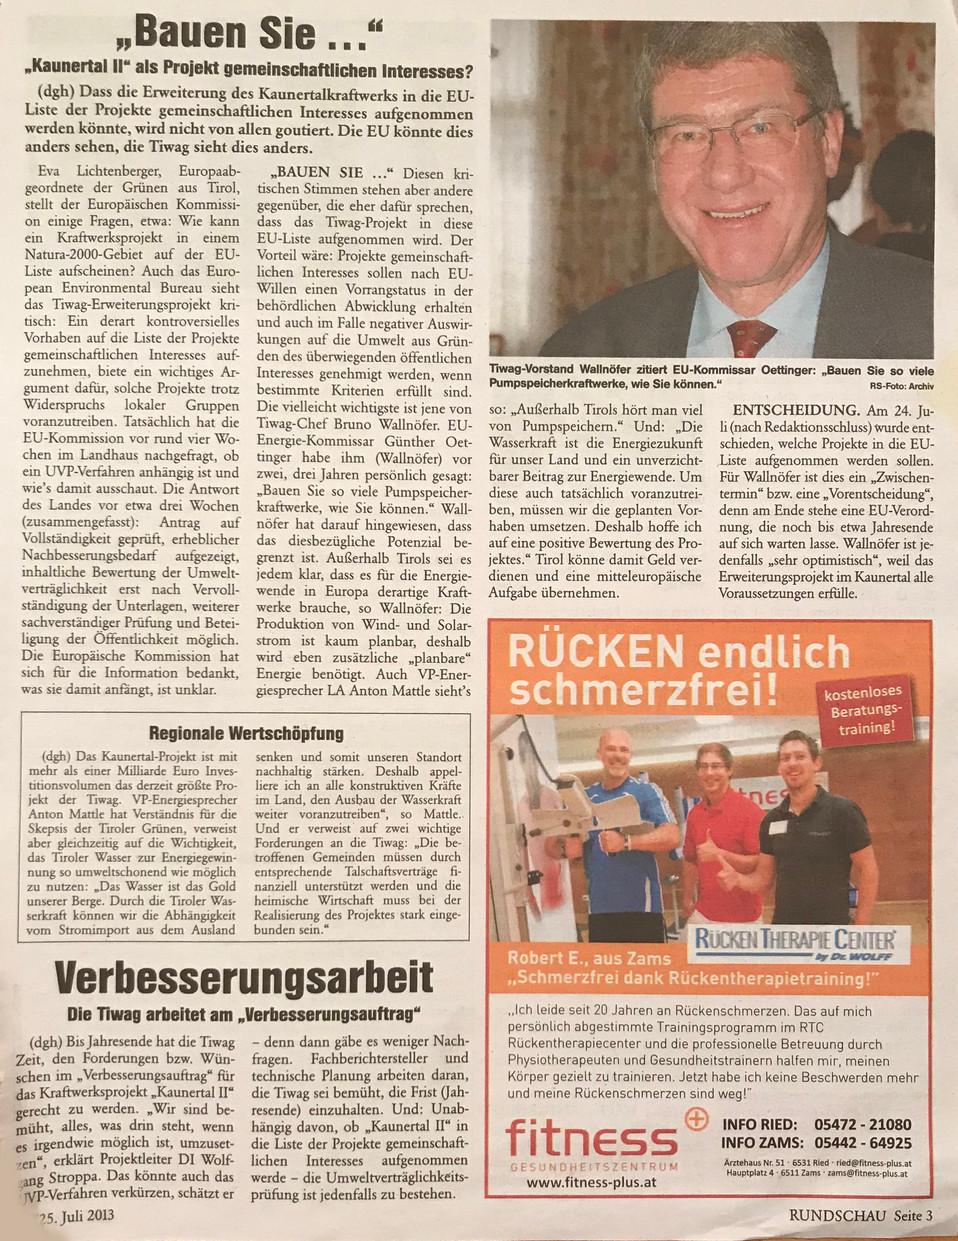 Rundschau 25.07.2013